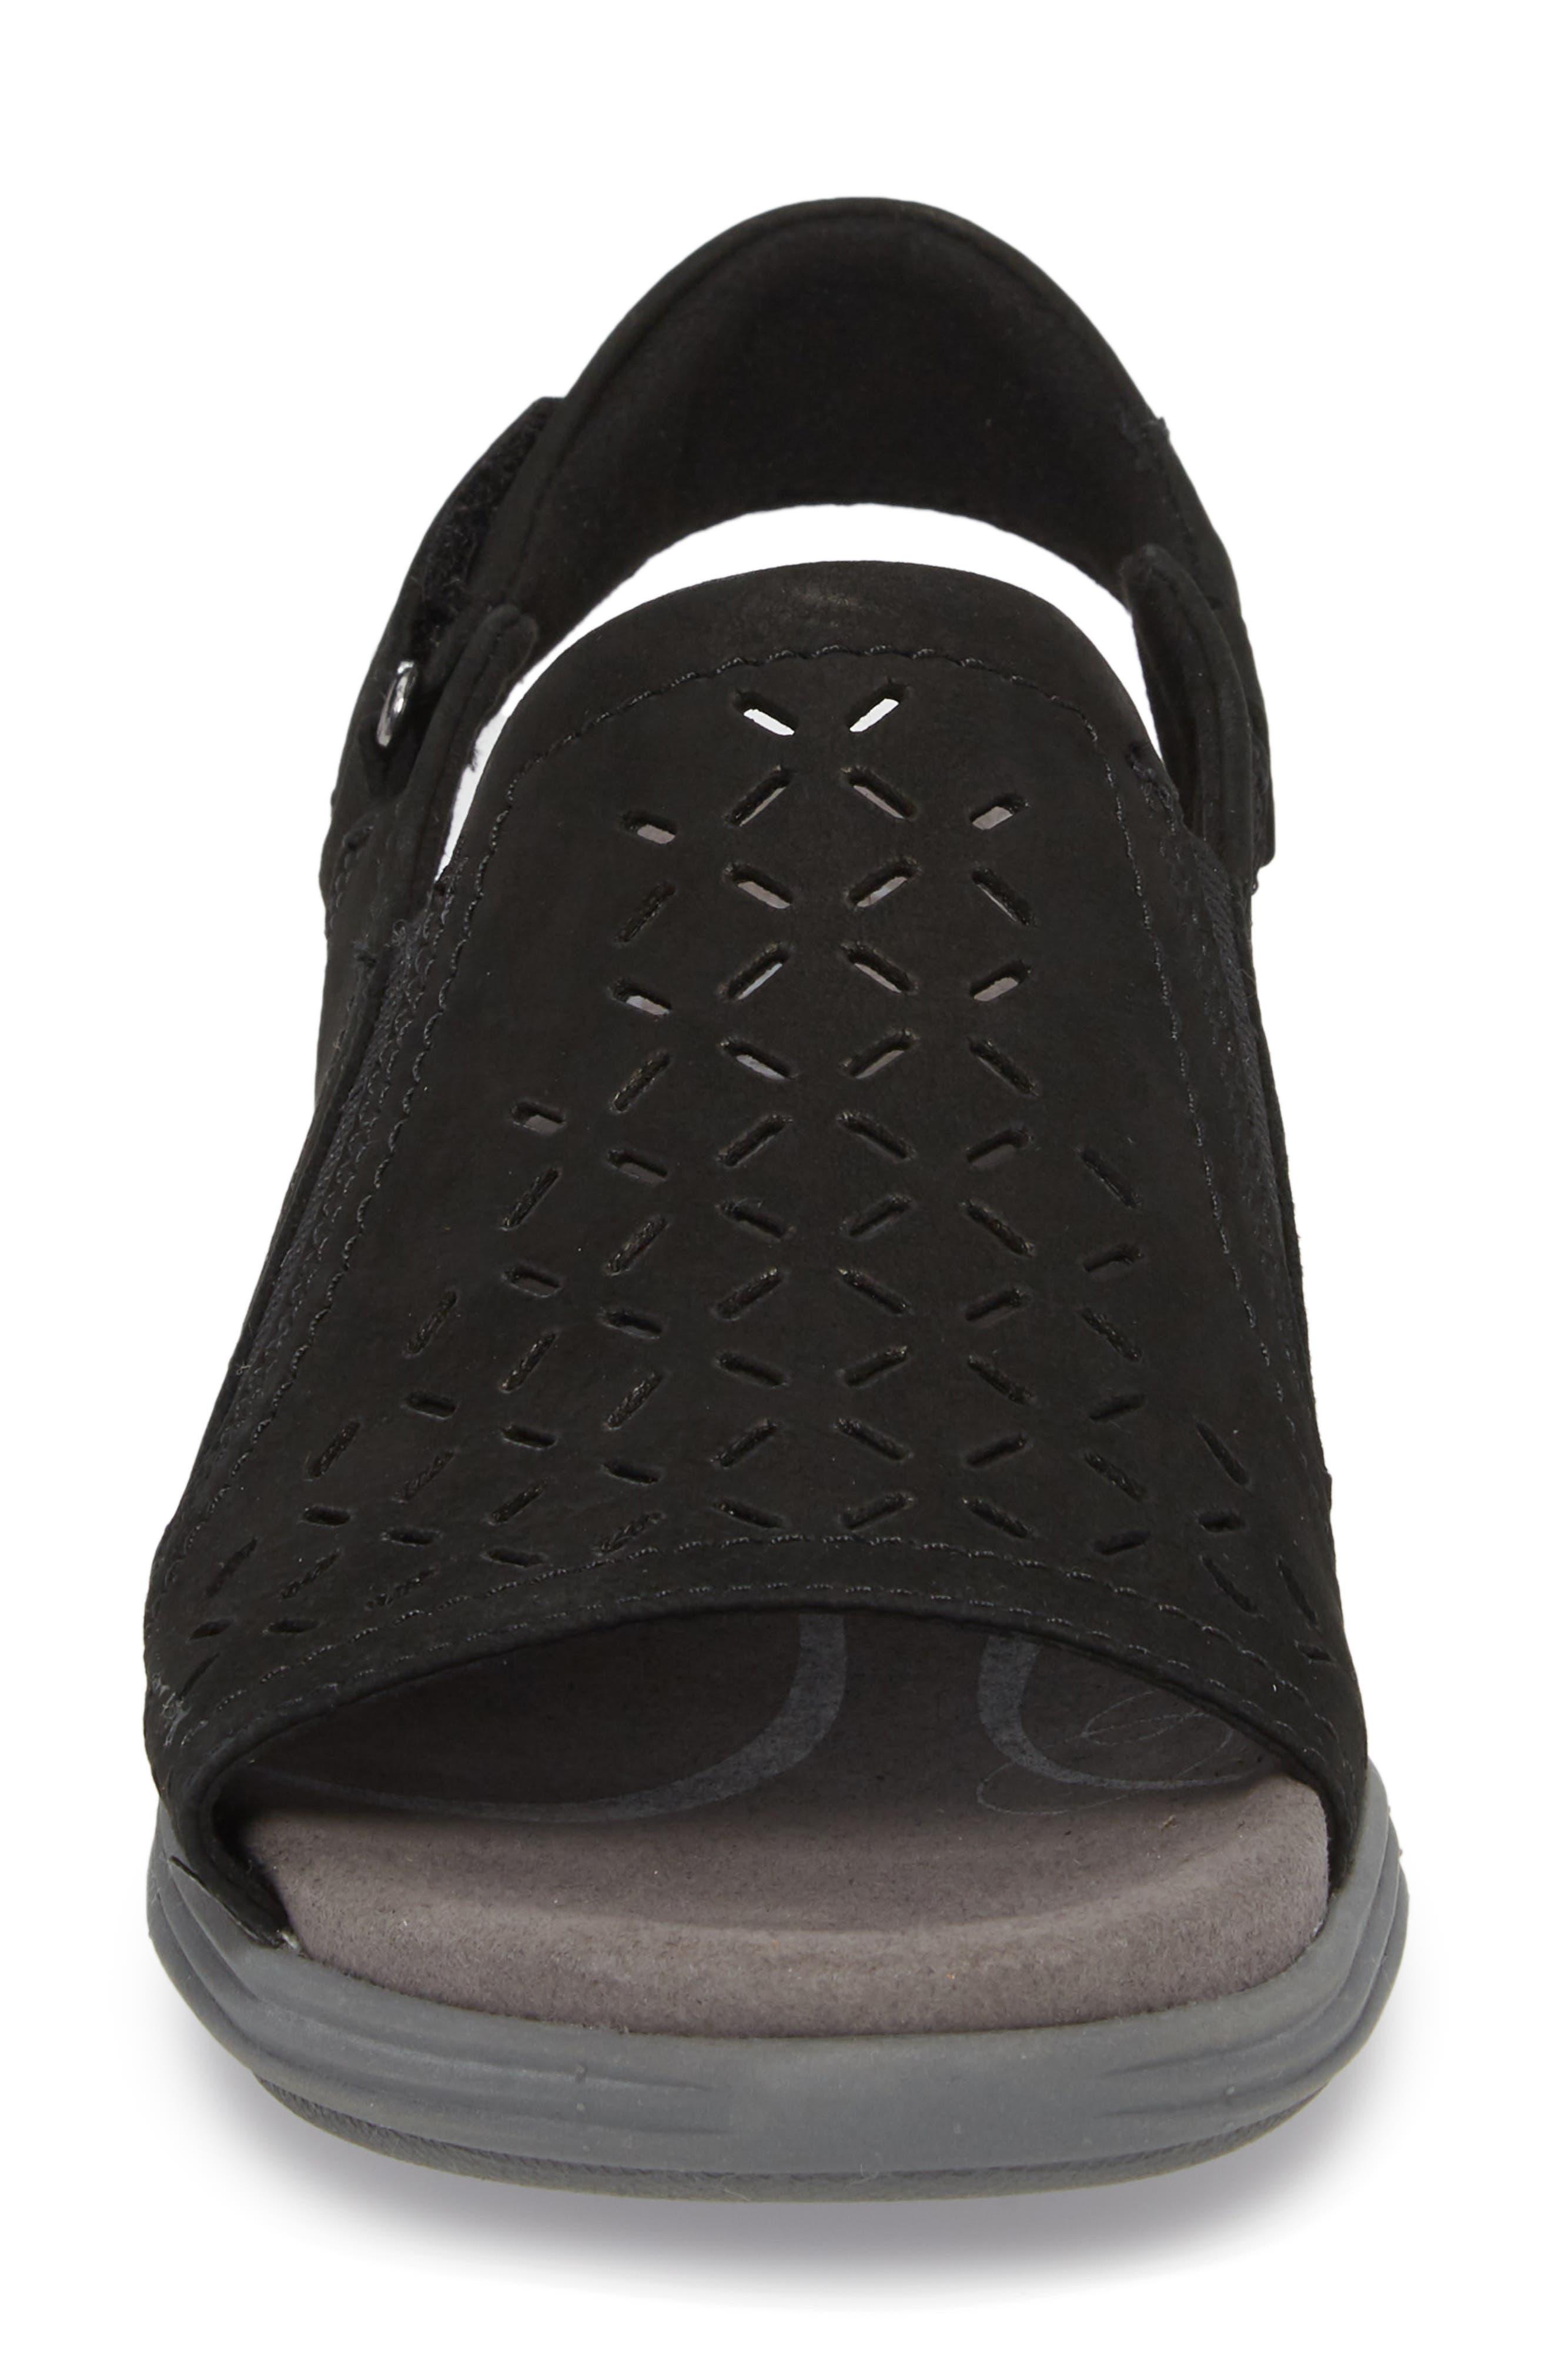 Beaumont Slingback Sandal,                             Alternate thumbnail 4, color,                             Black Nubuck Leather